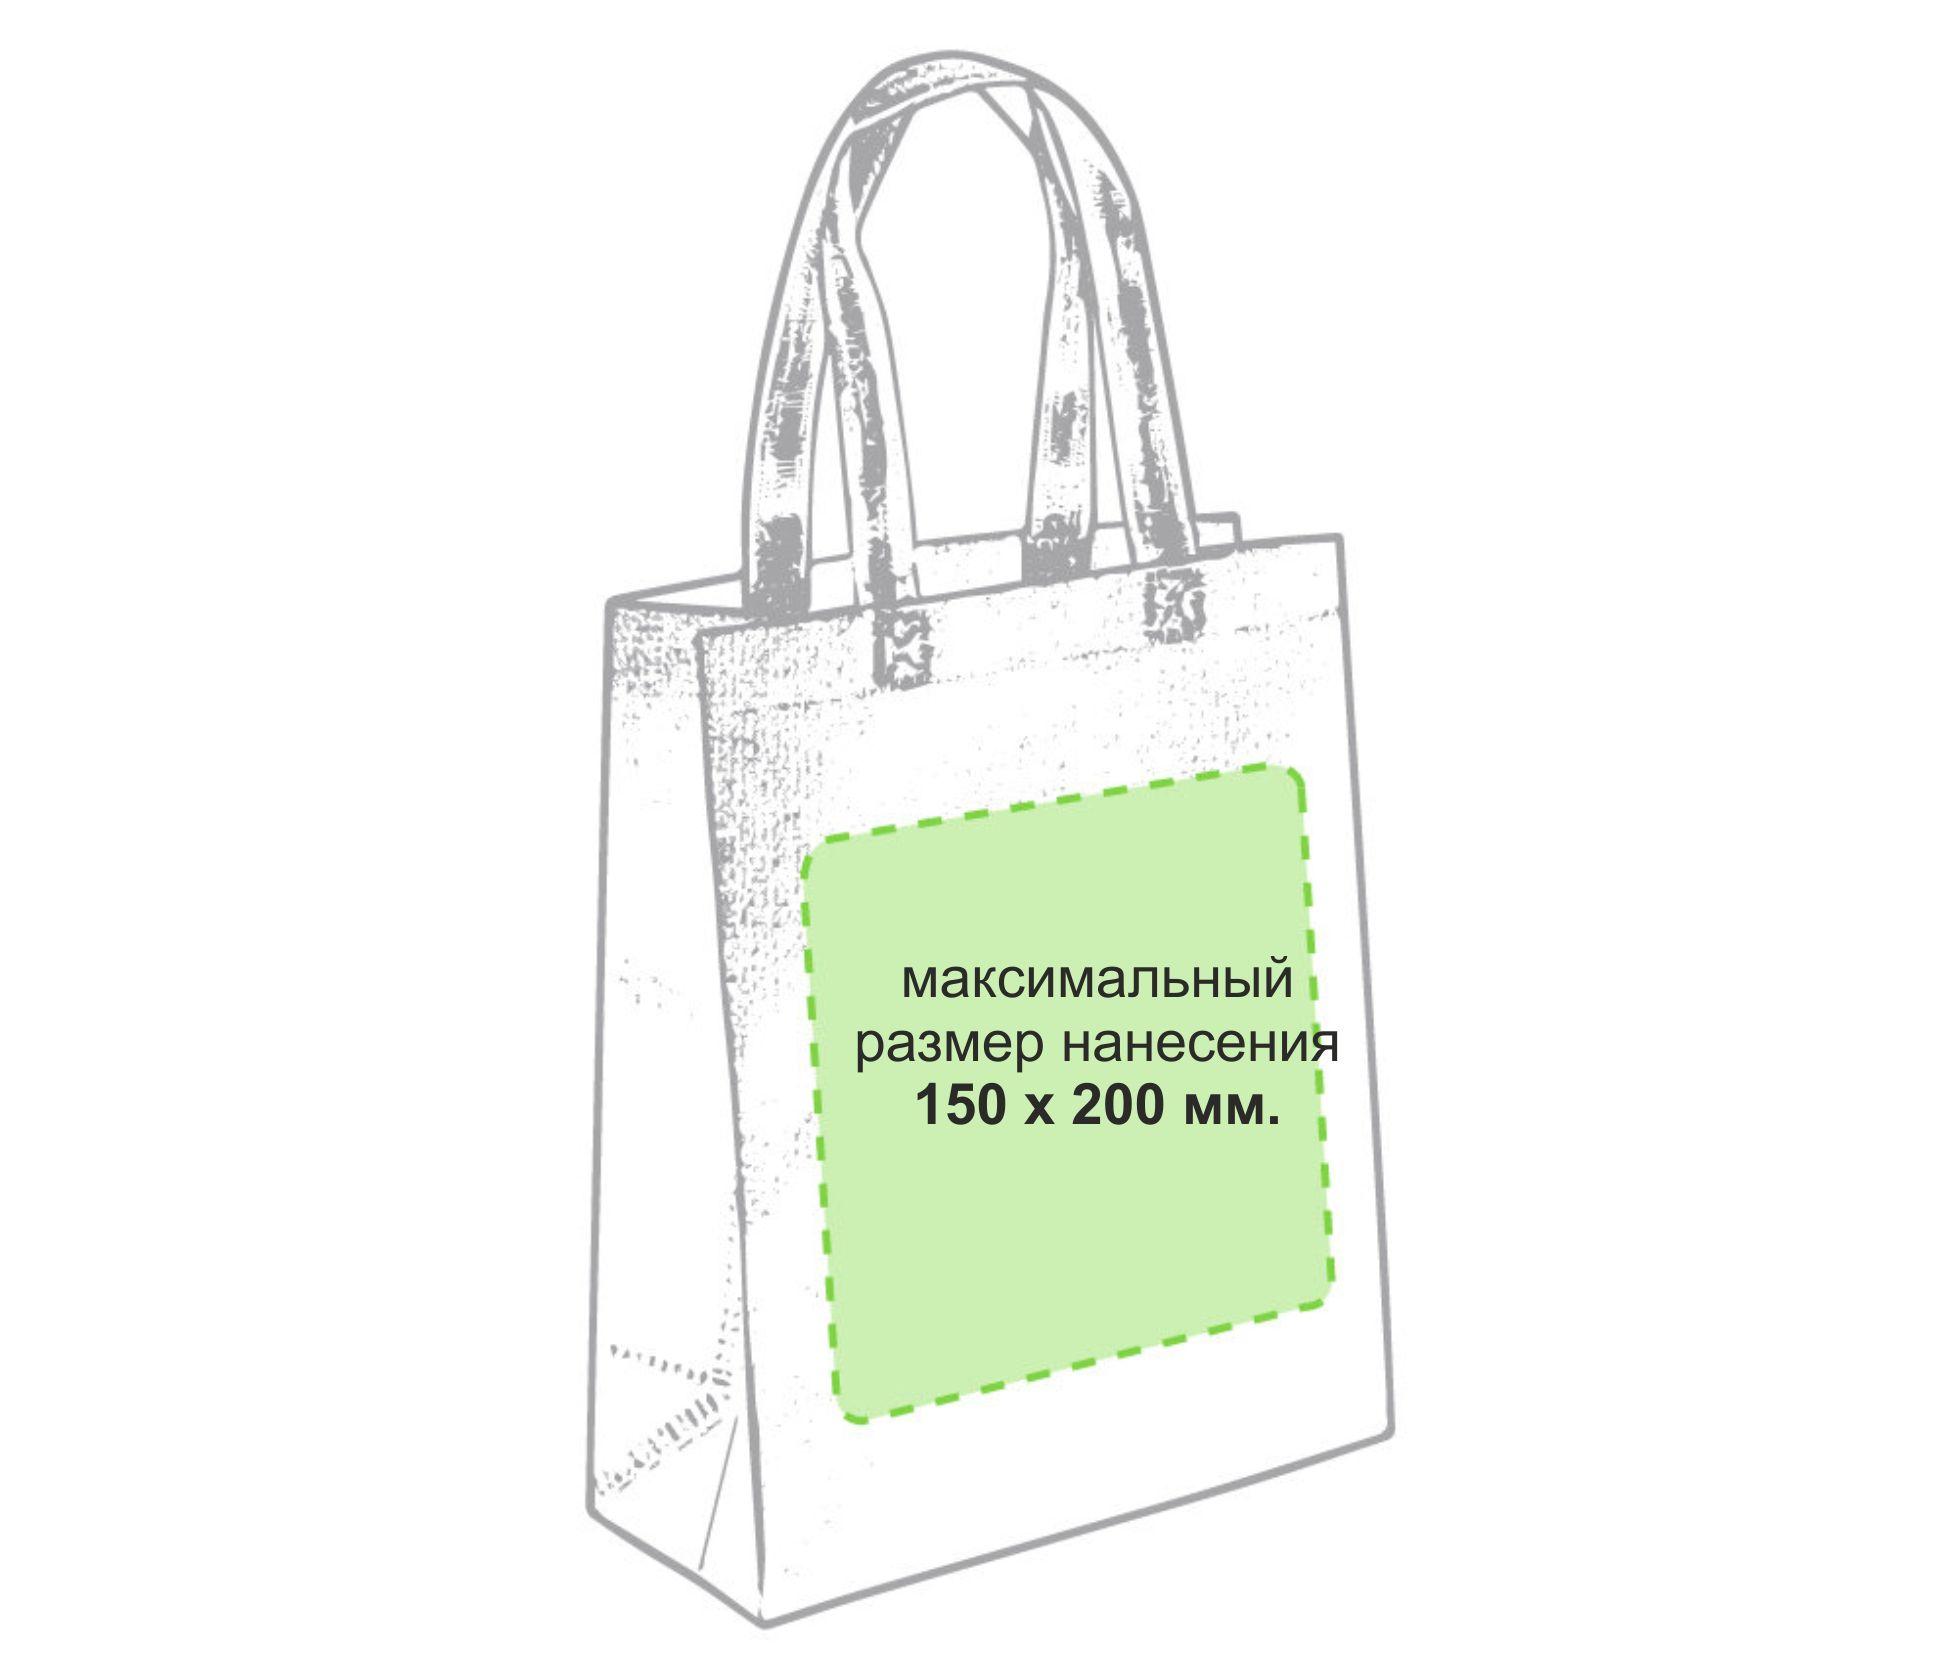 сумки с логотипом в самаре